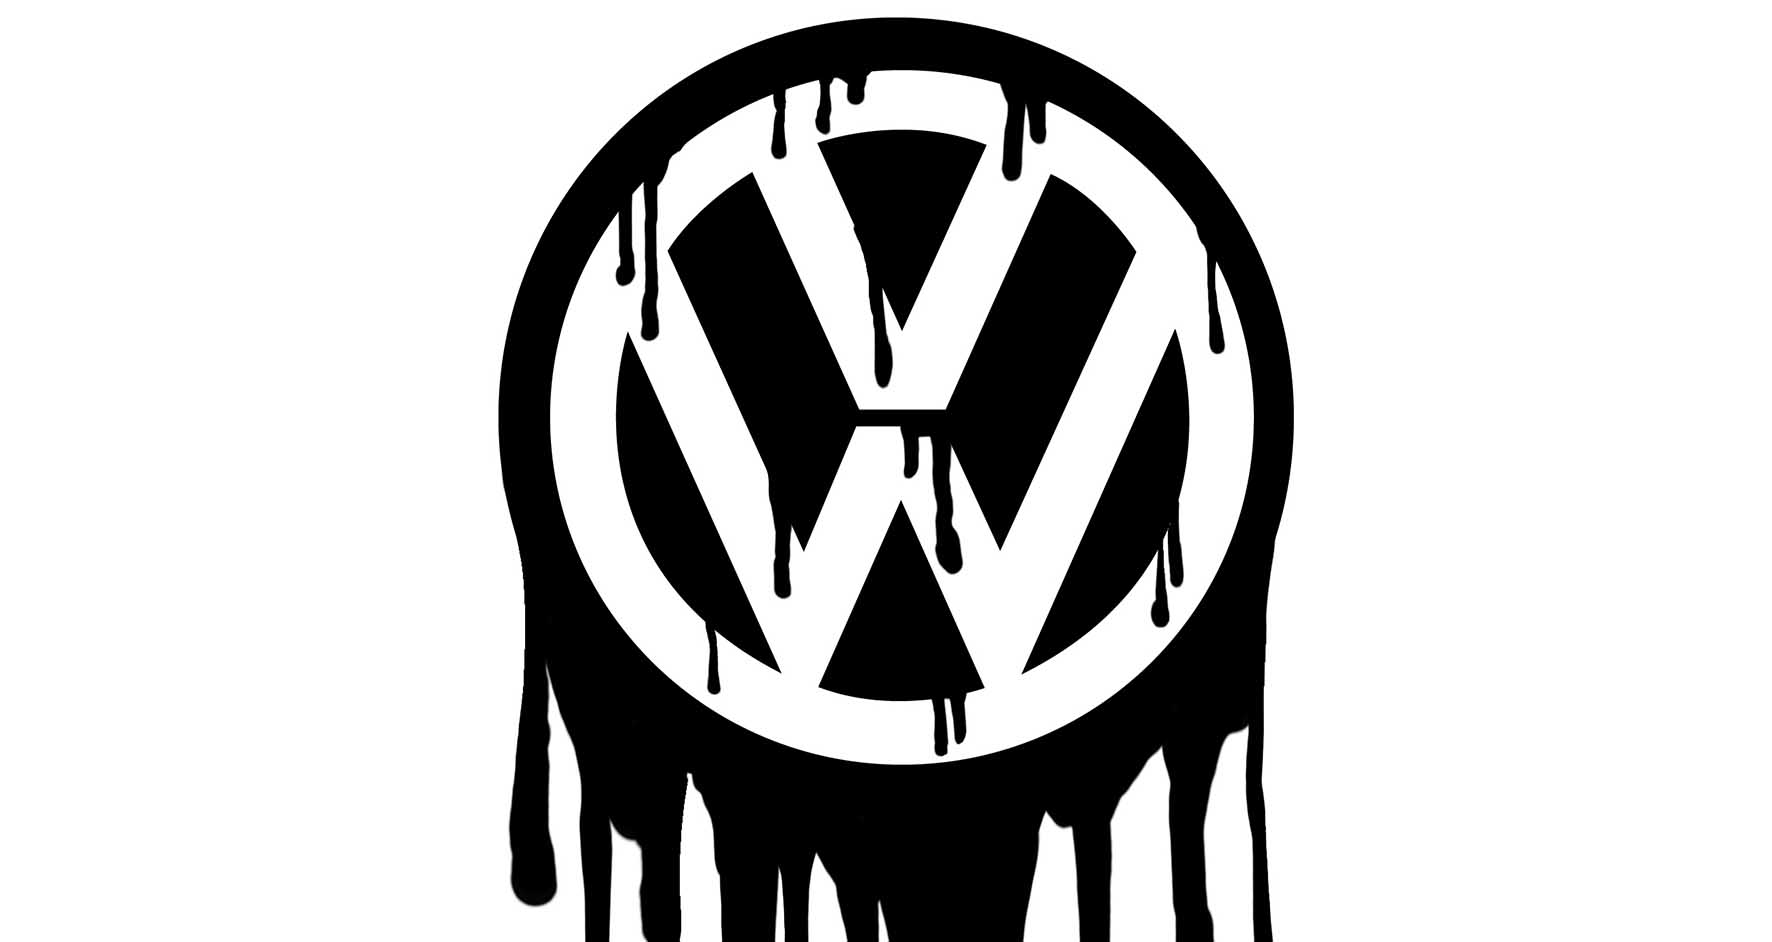 antitrust ue volkswagen logo sanguinante